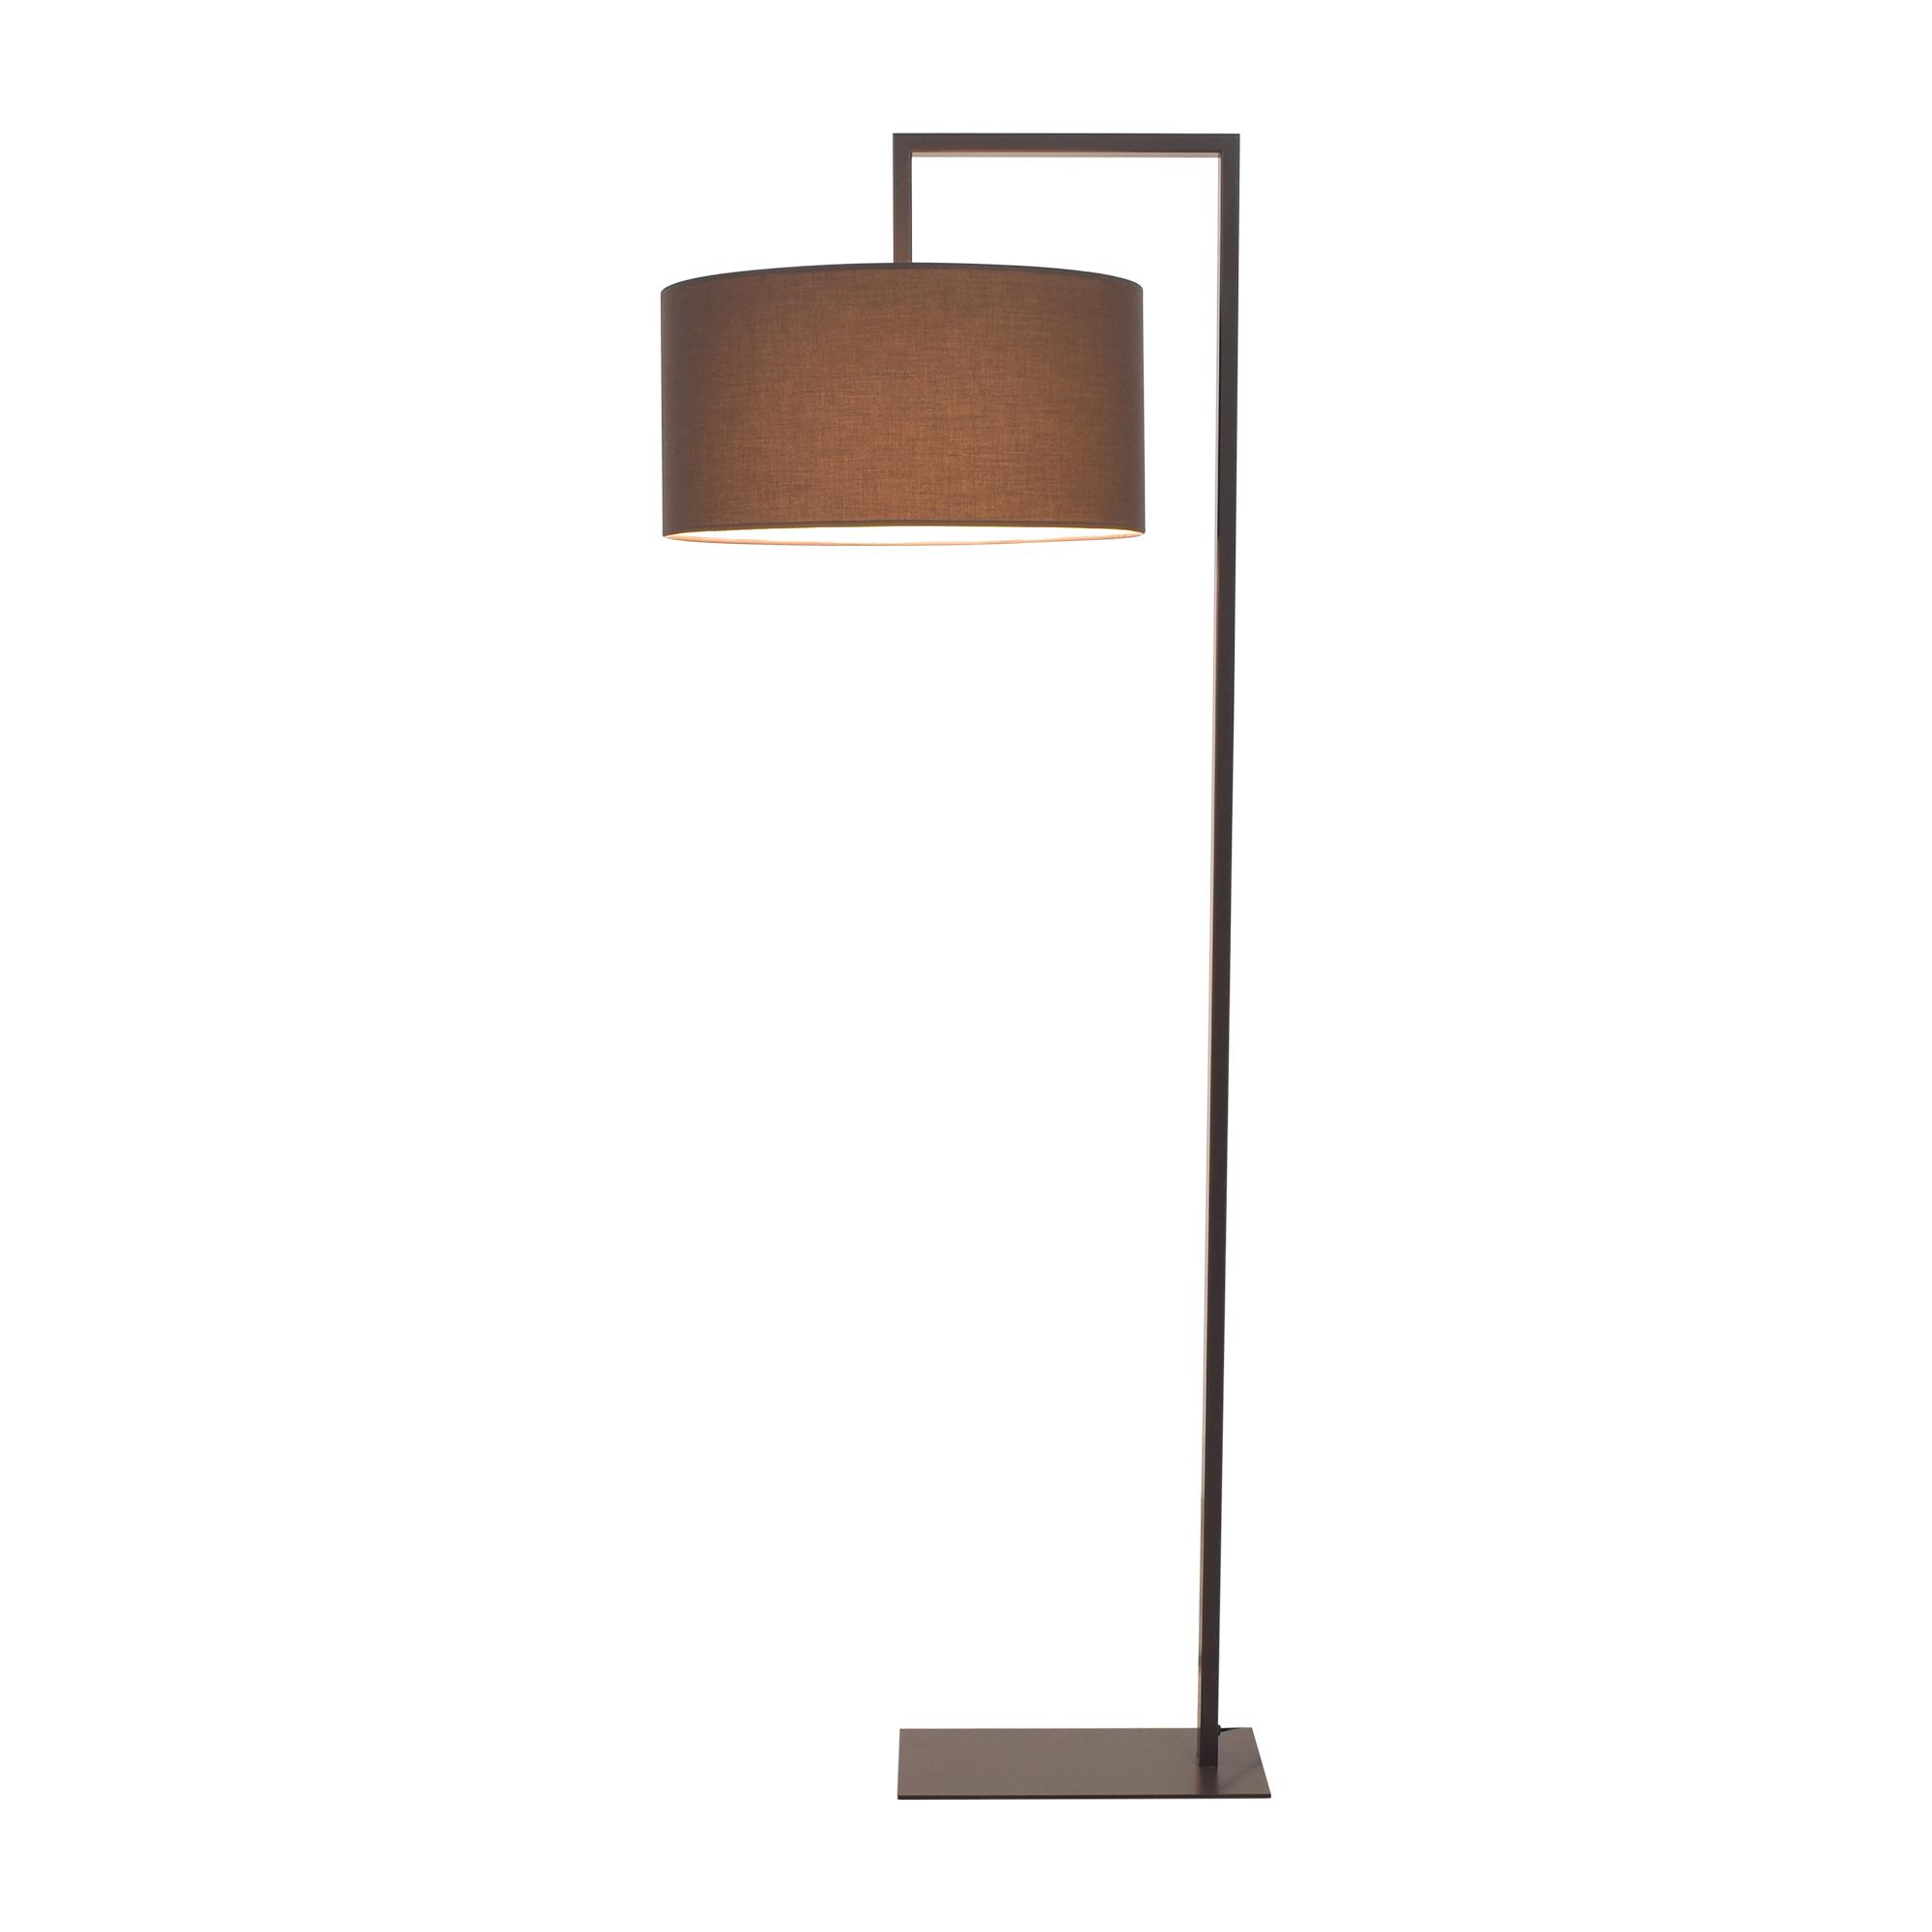 Roche Bobois Roche Bobois Les Heritiers Floor Lamp discount